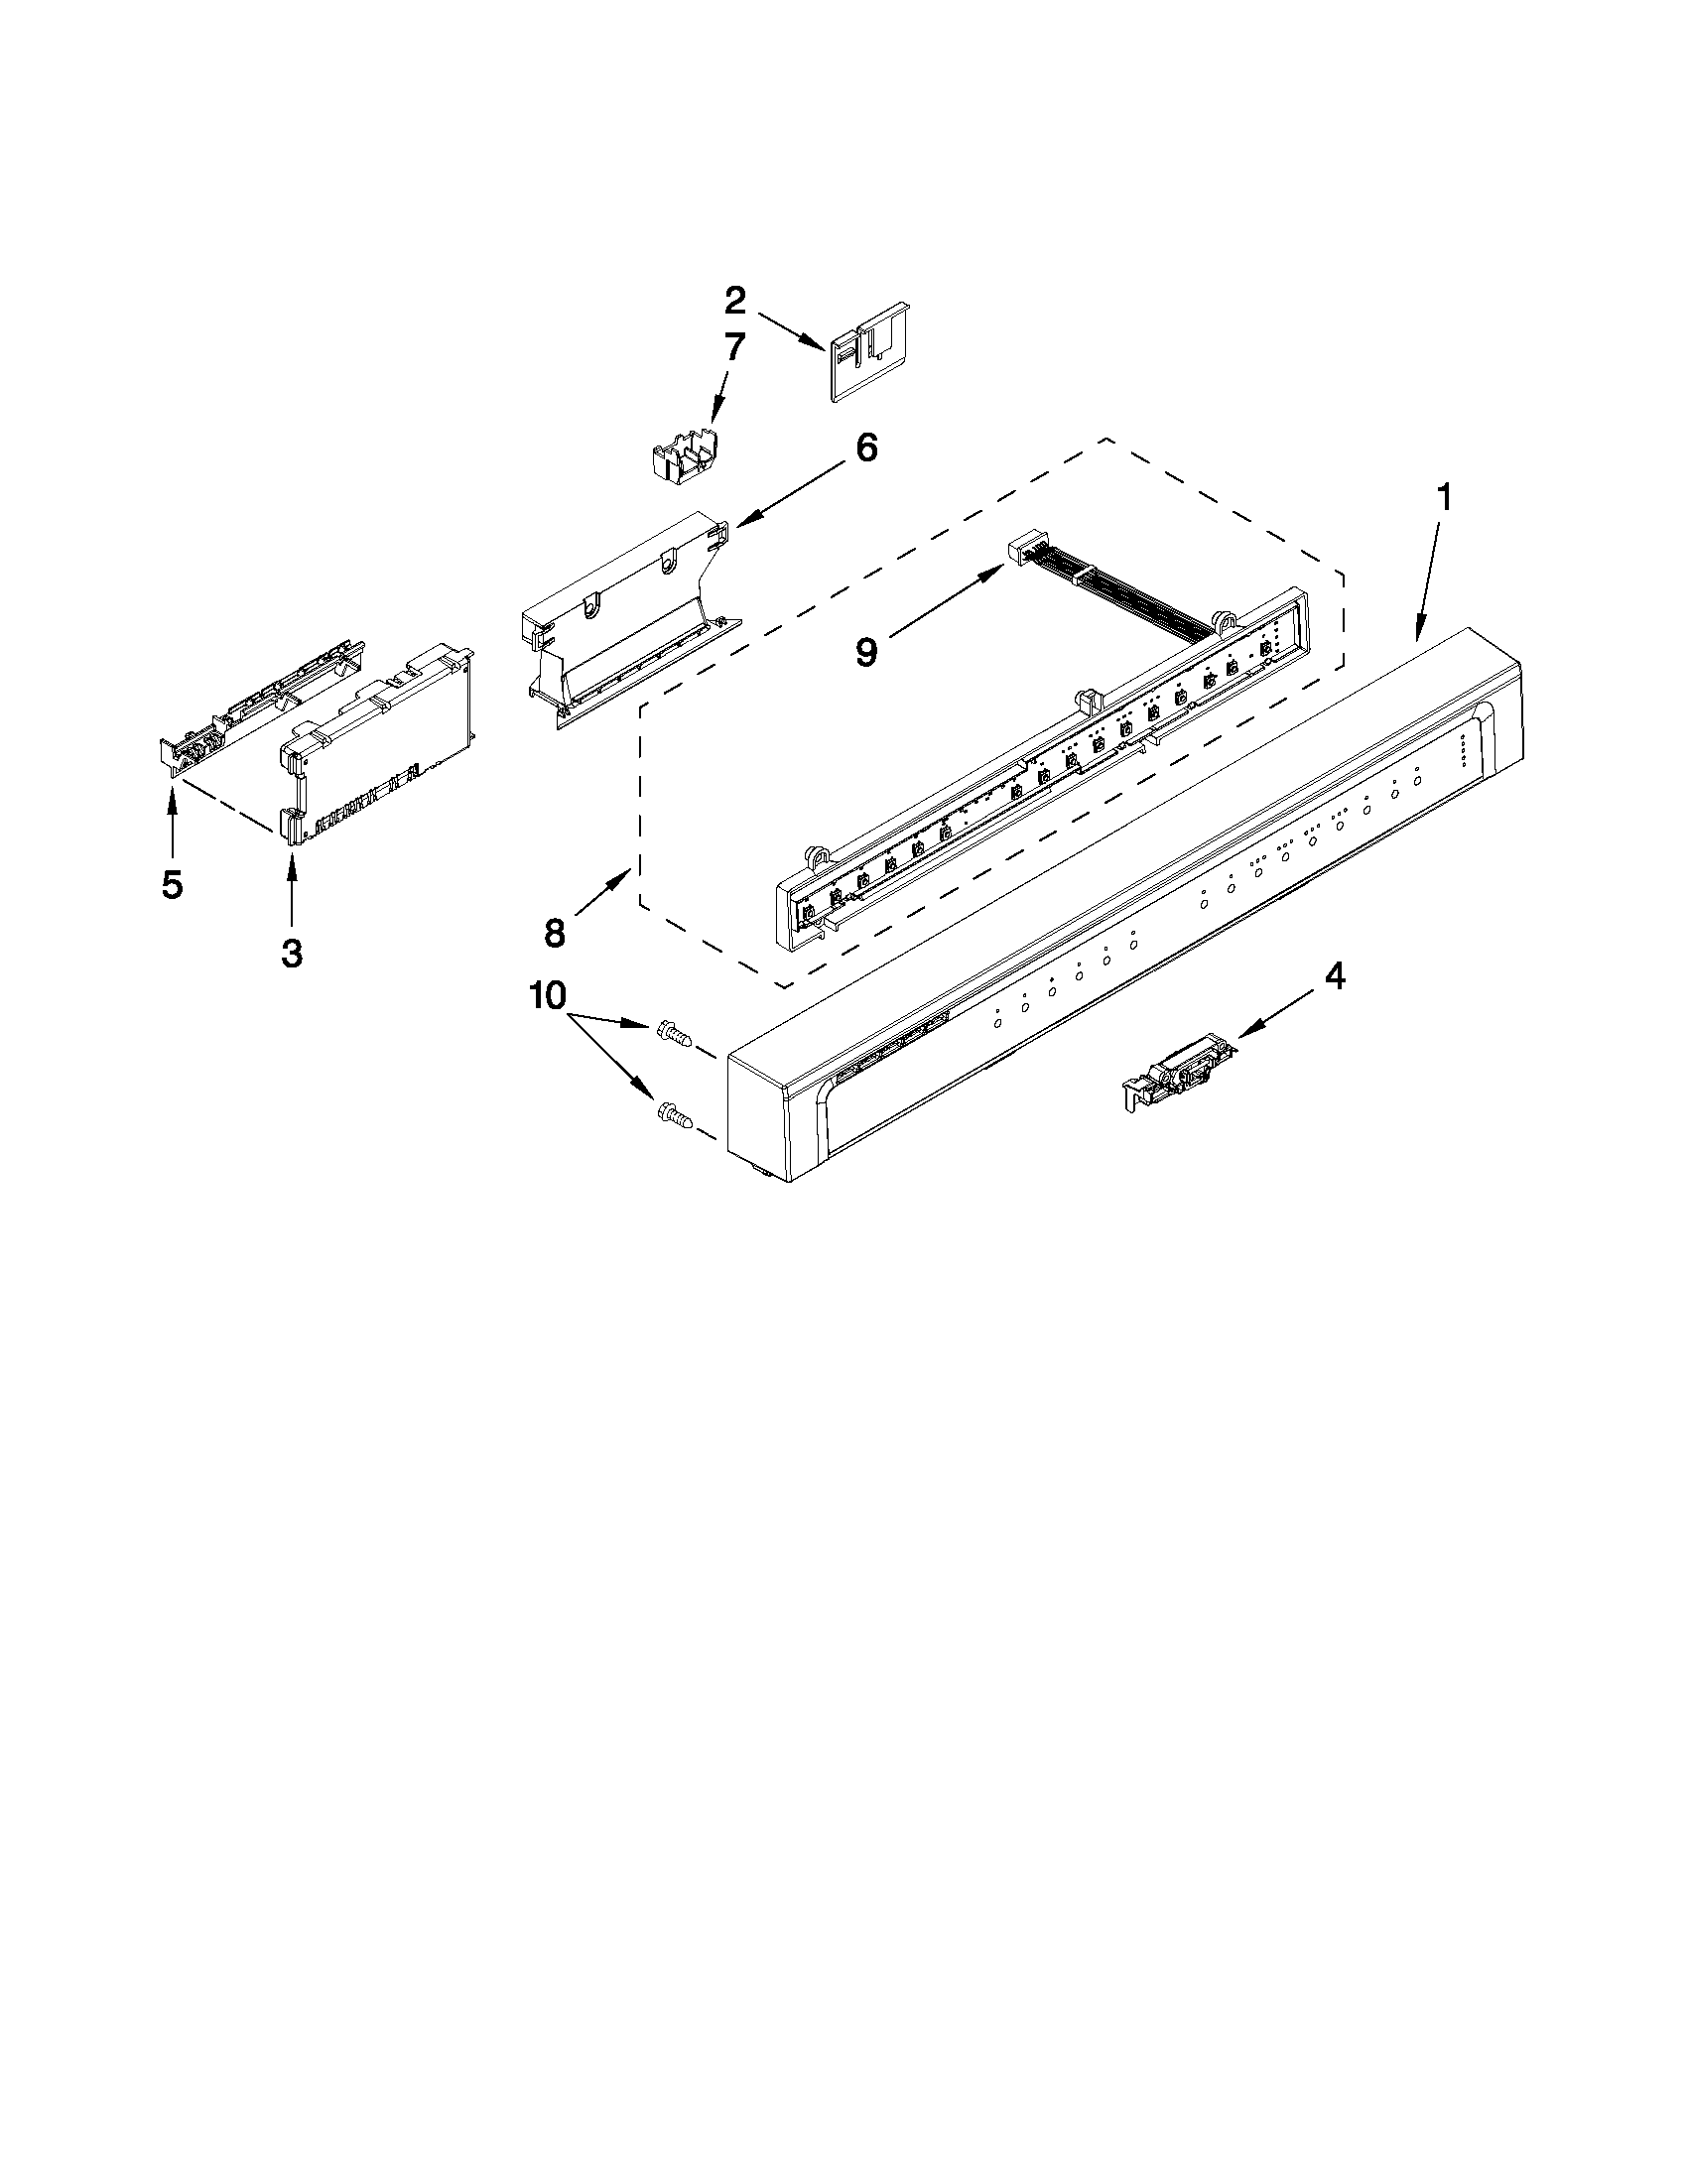 whirlpool model wdf750sayb0 dishwasher genuine parts